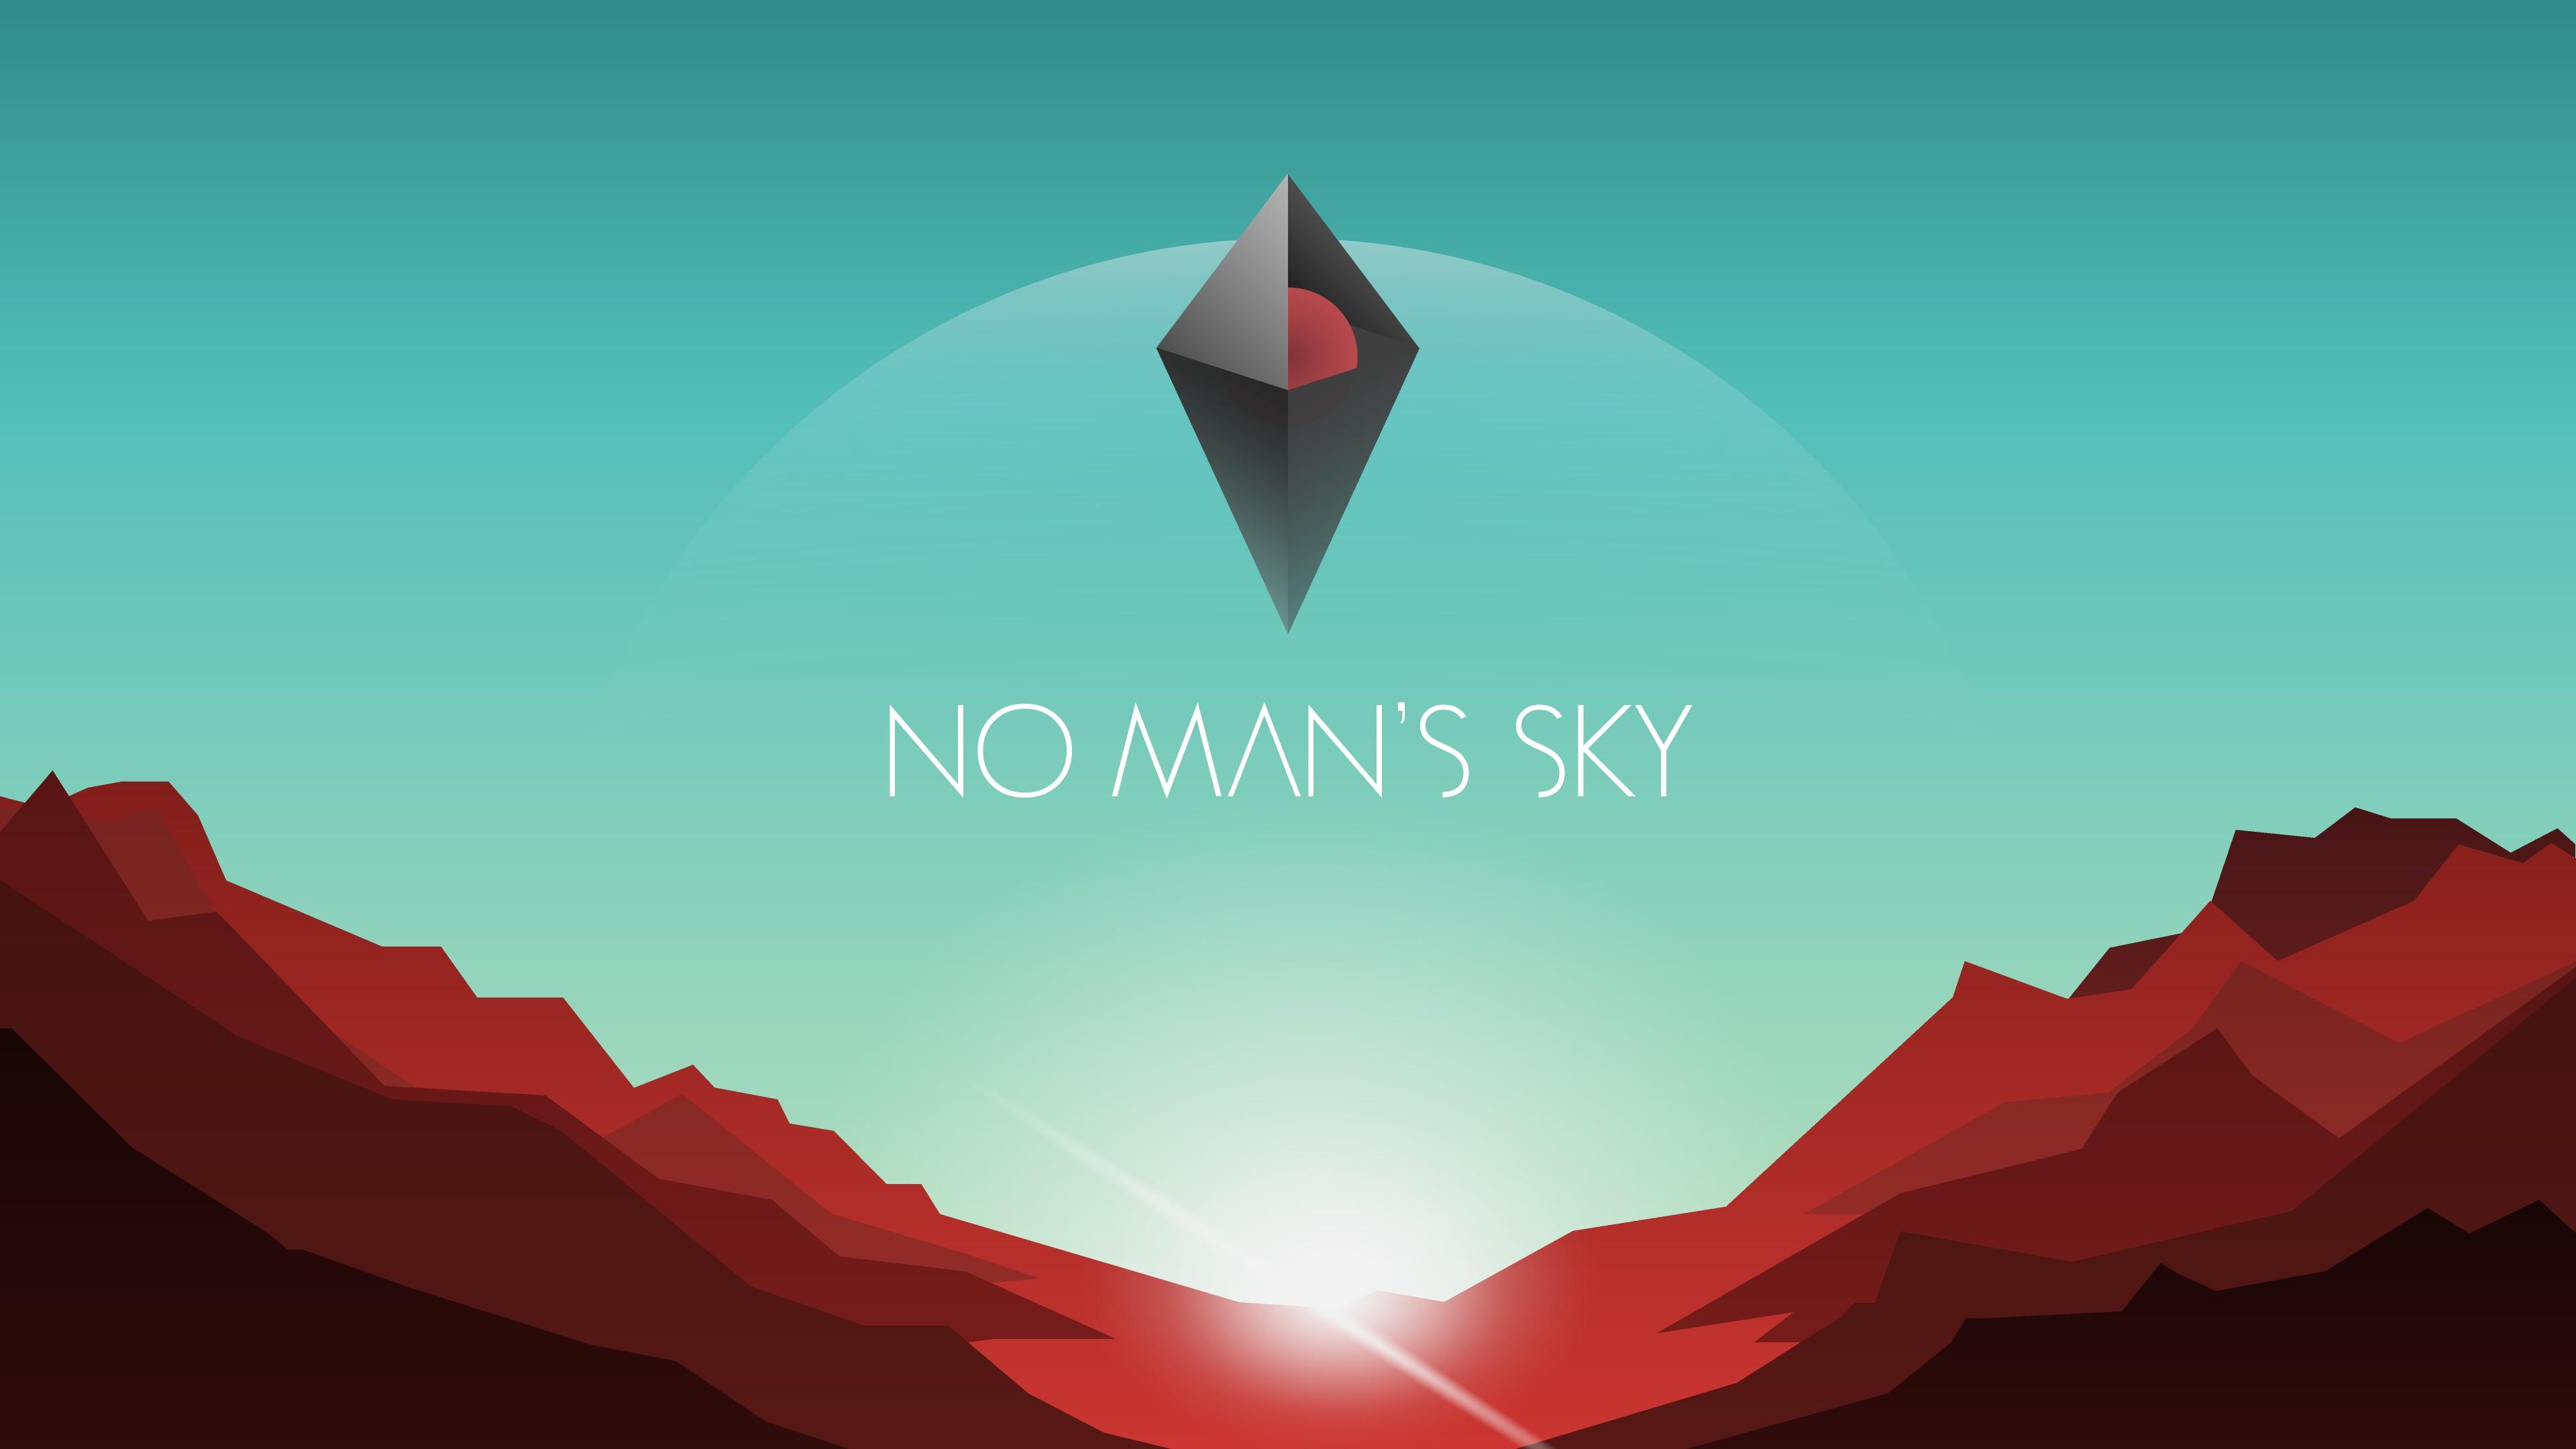 No Man S Sky Wallpaper 4k Download Free Cool Full Hd